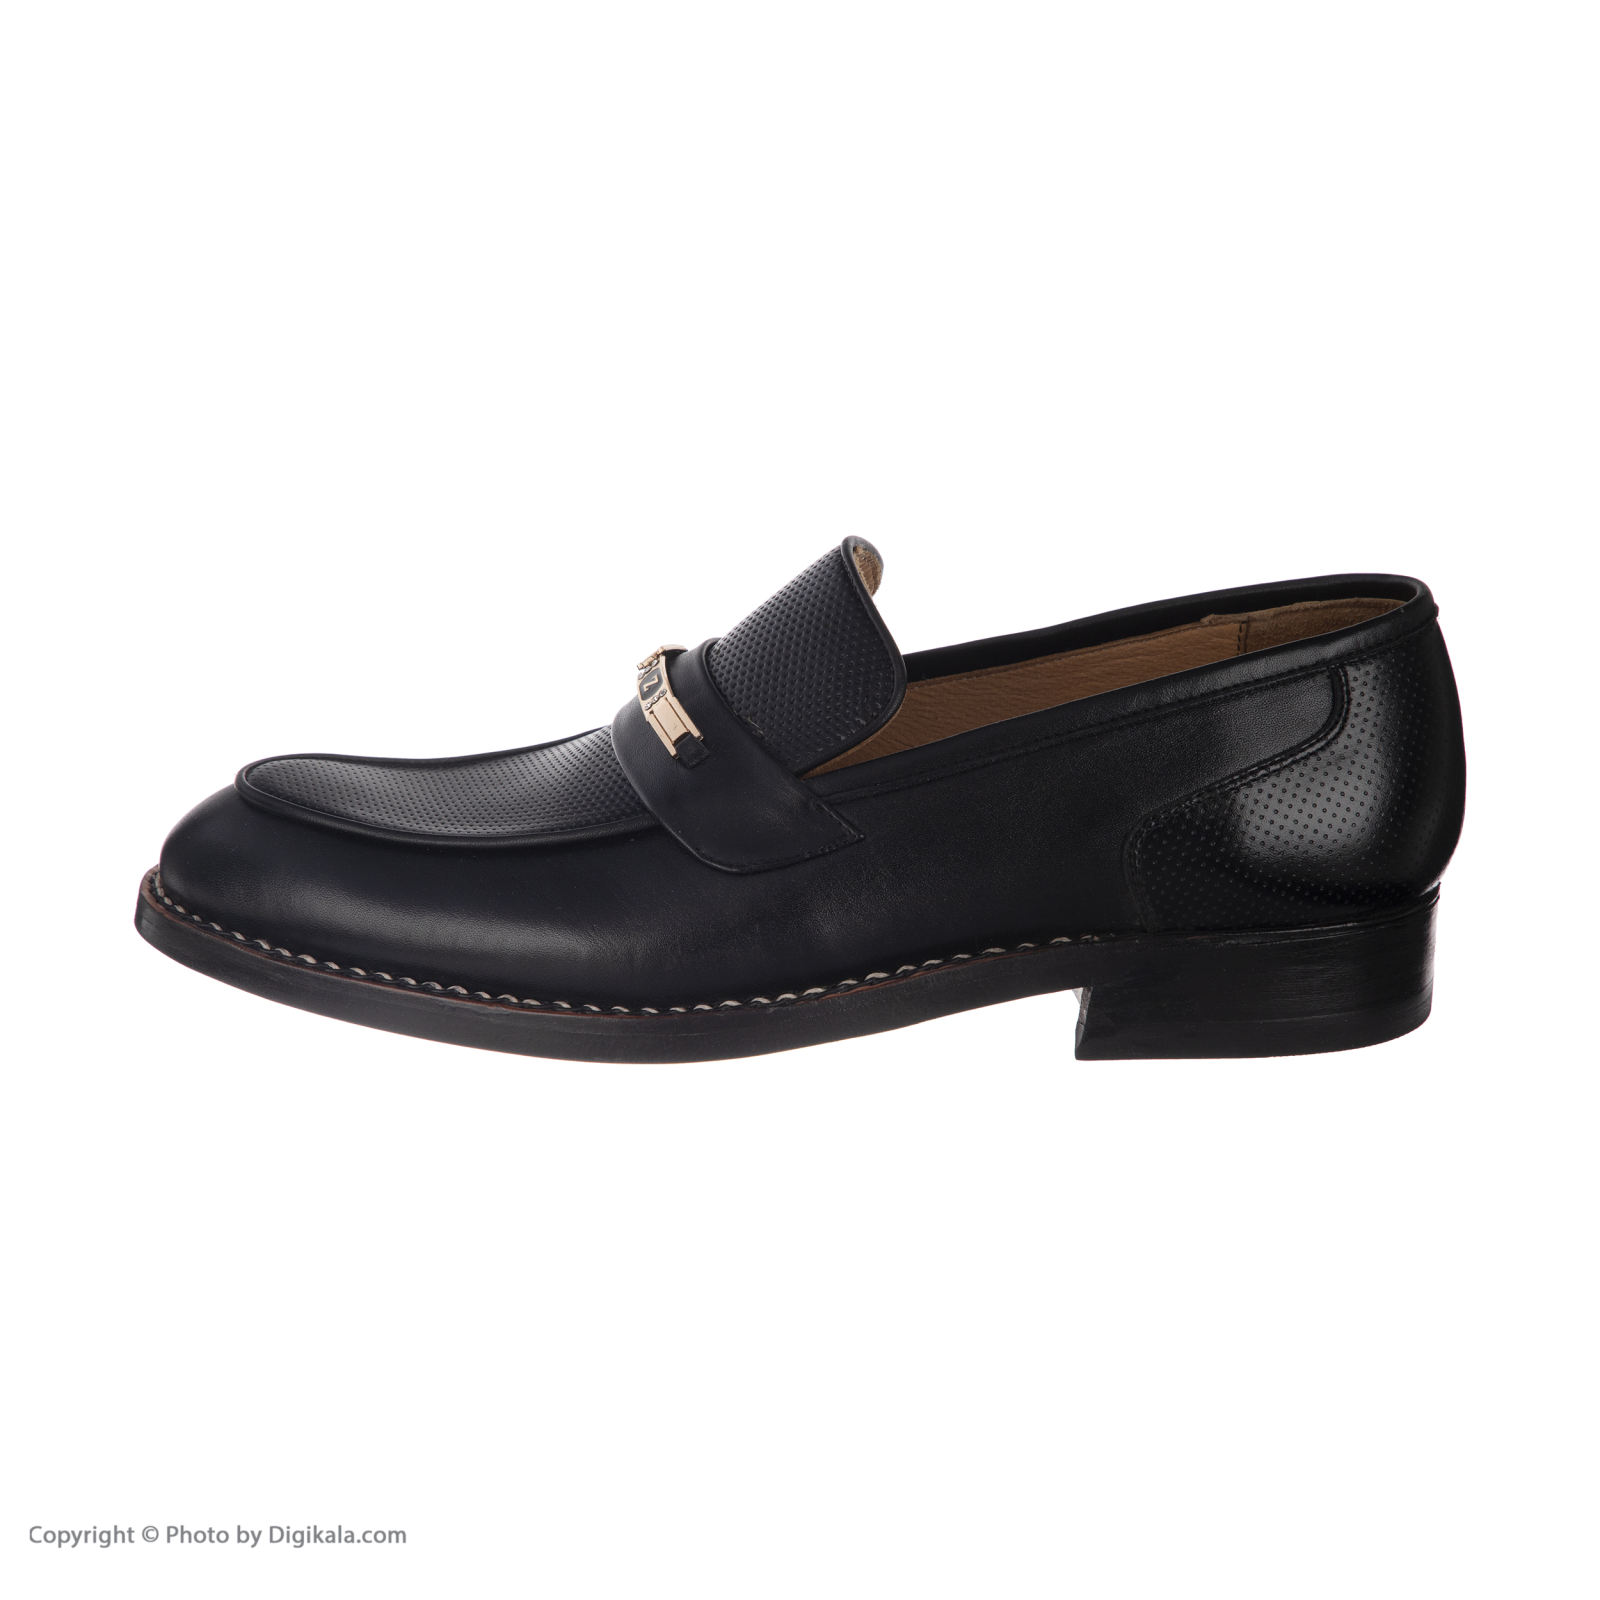 کفش مردانه نظری کد 403 -  - 1